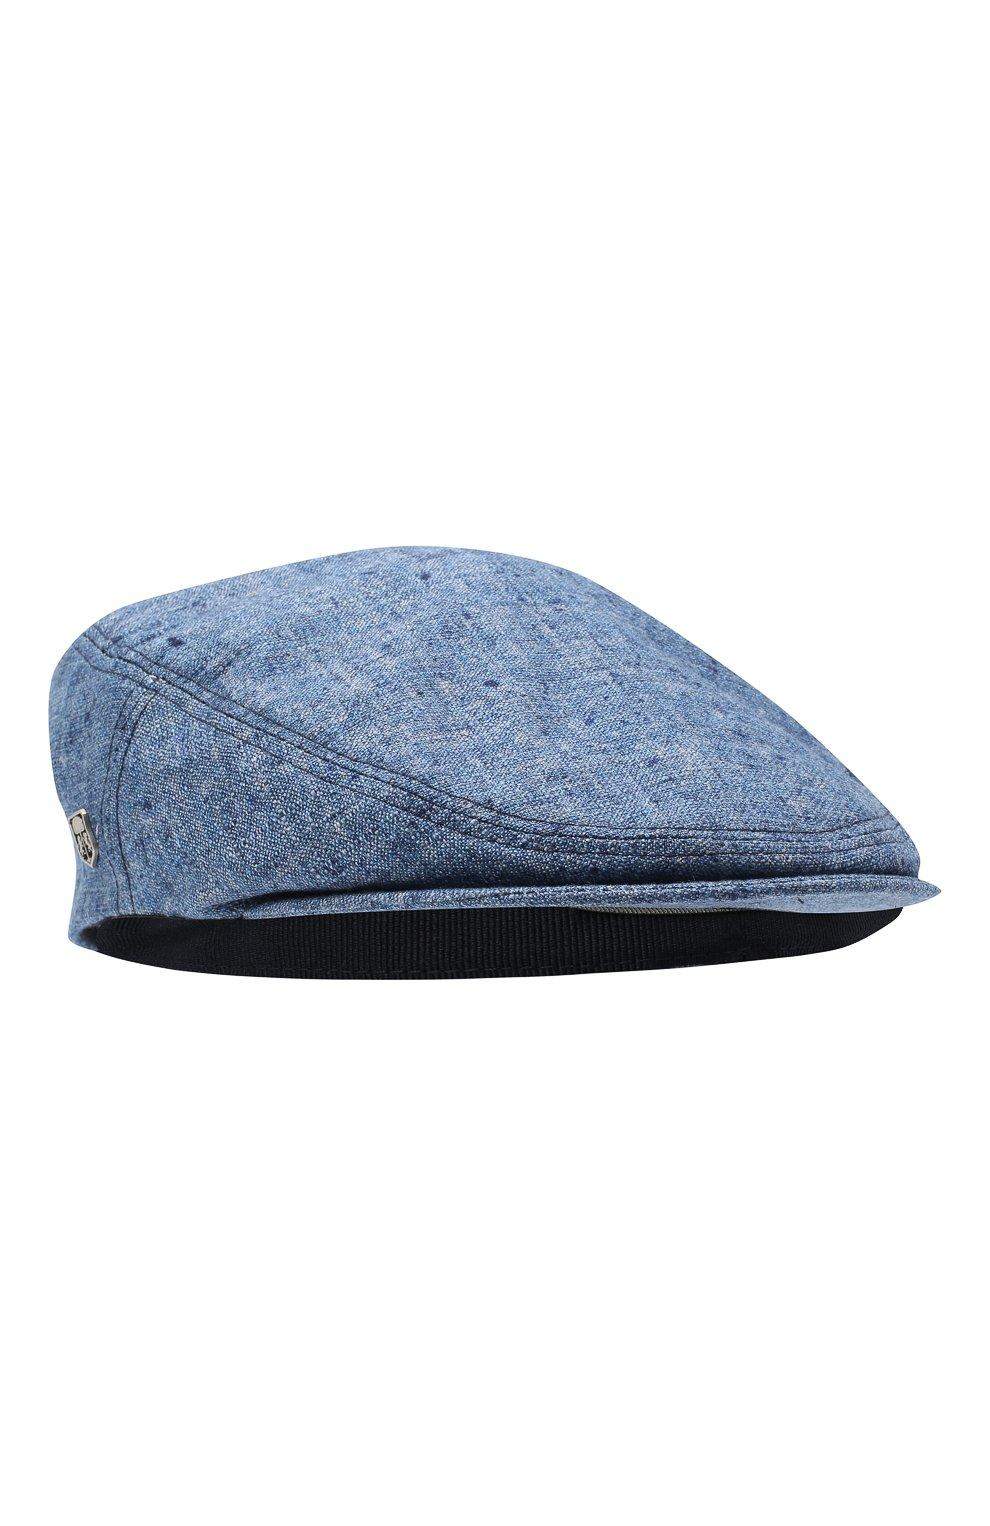 Мужская кепи из смеси шелка и шерсти CORNELIANI синего цвета, арт. 850338-0129241/00   Фото 1